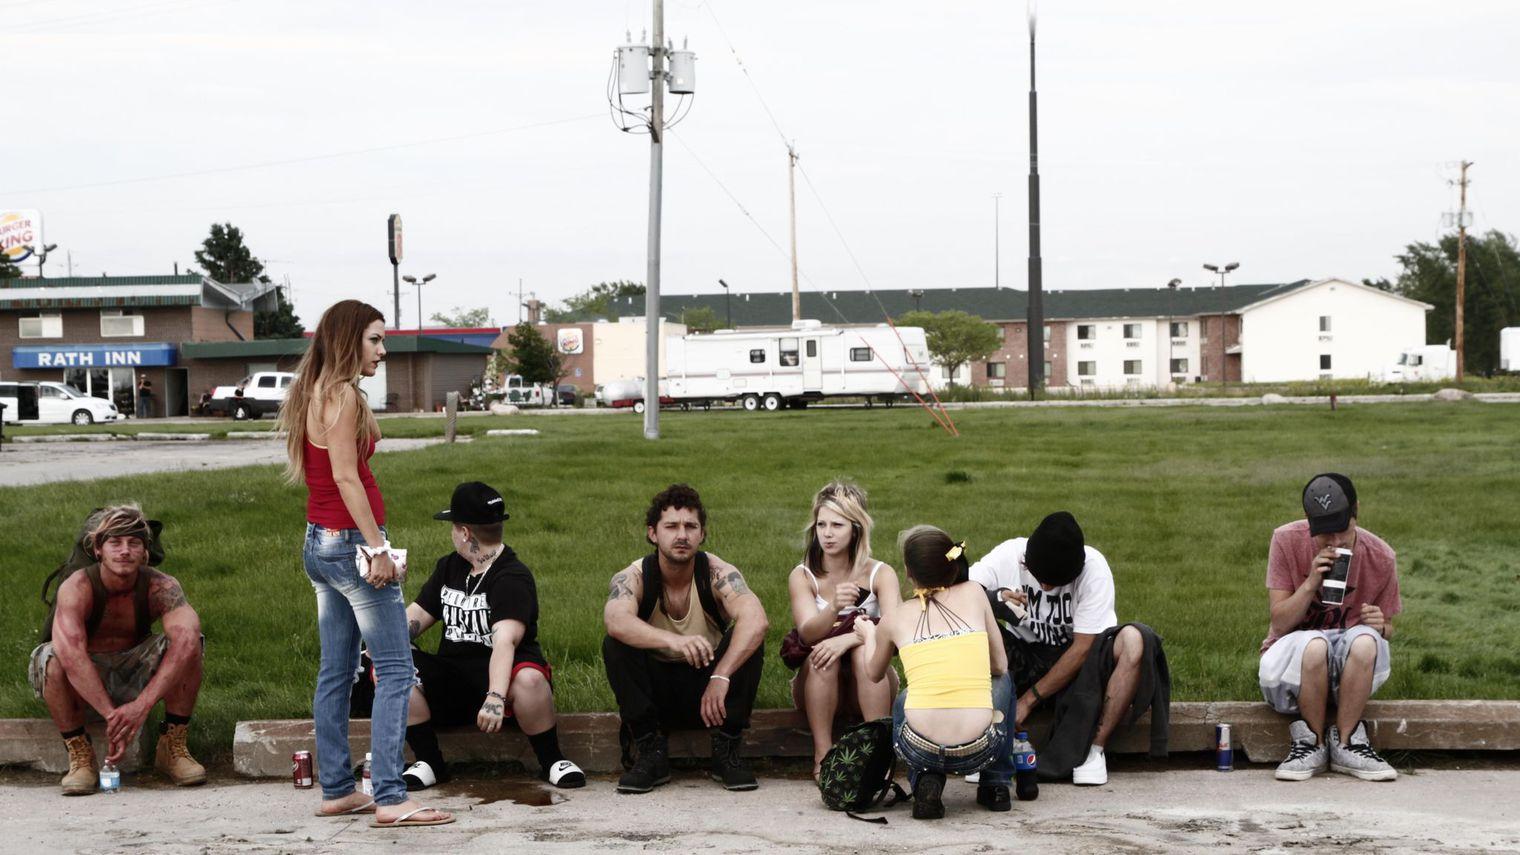 Road trip tale 'American Honey' runs on fumes